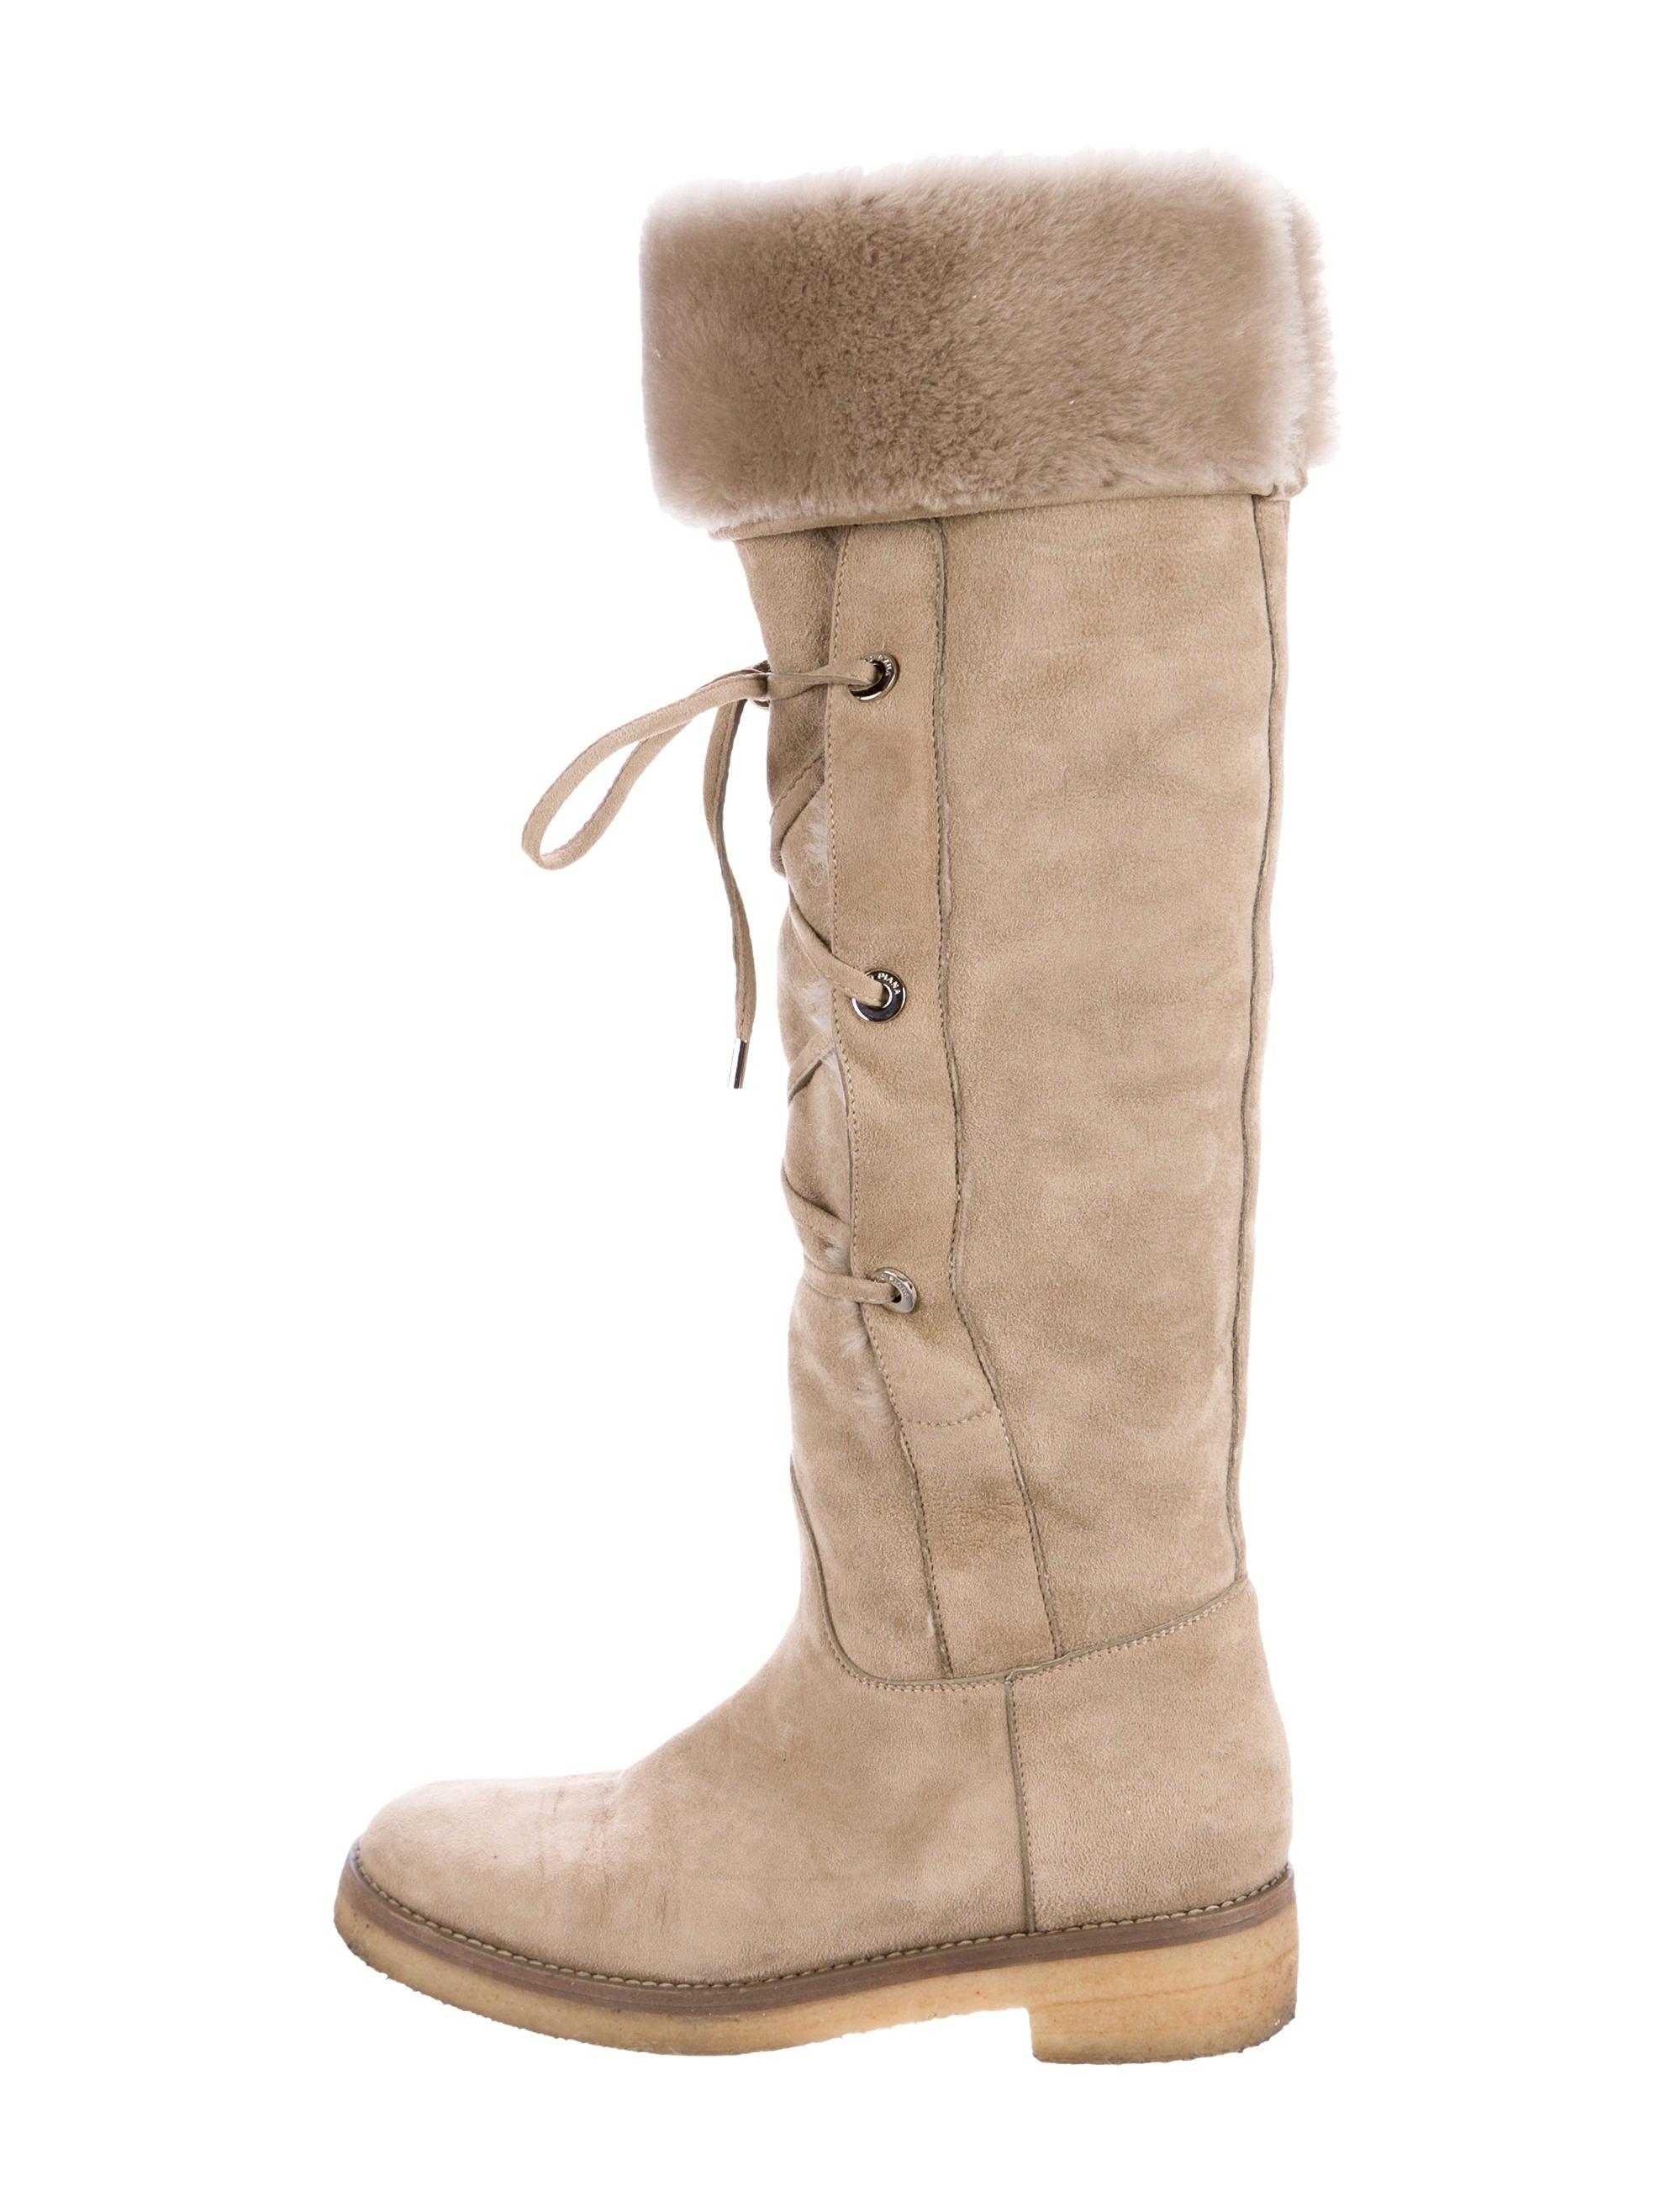 Loro Piana Shoes Price